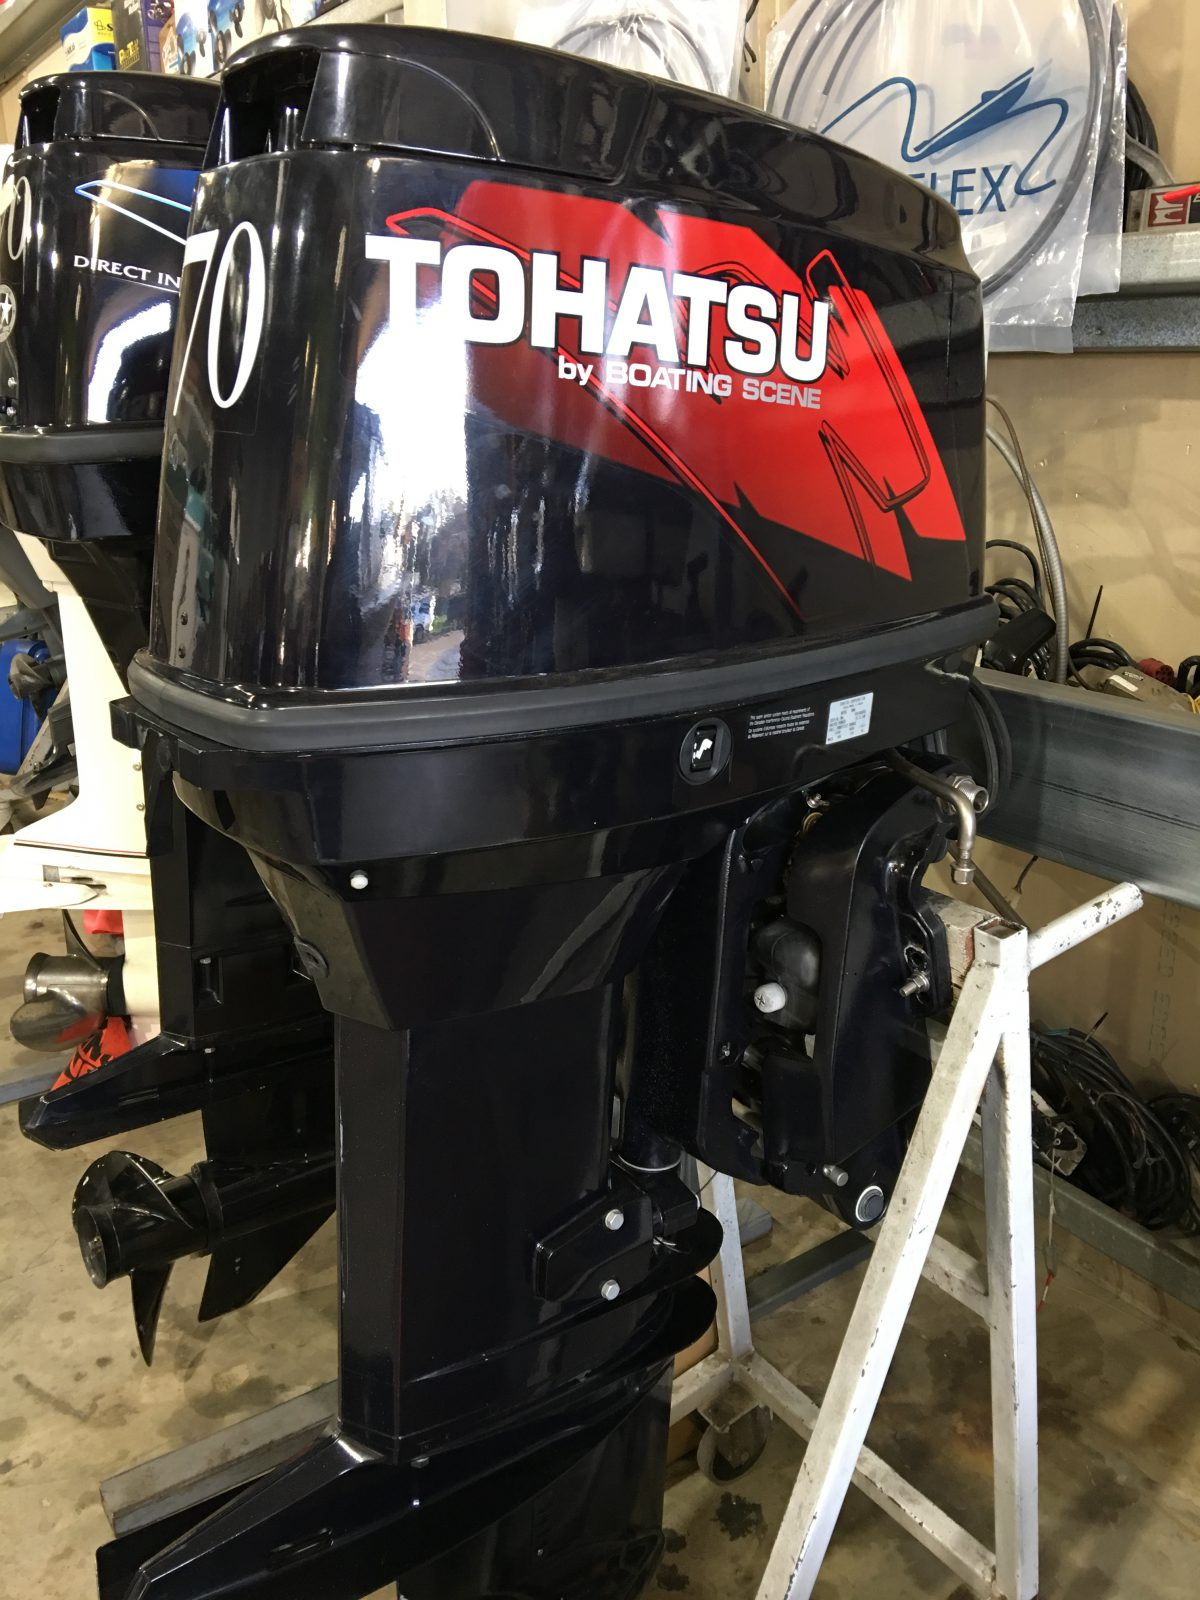 Tohatsu 70hp - Sold - Boating Scene